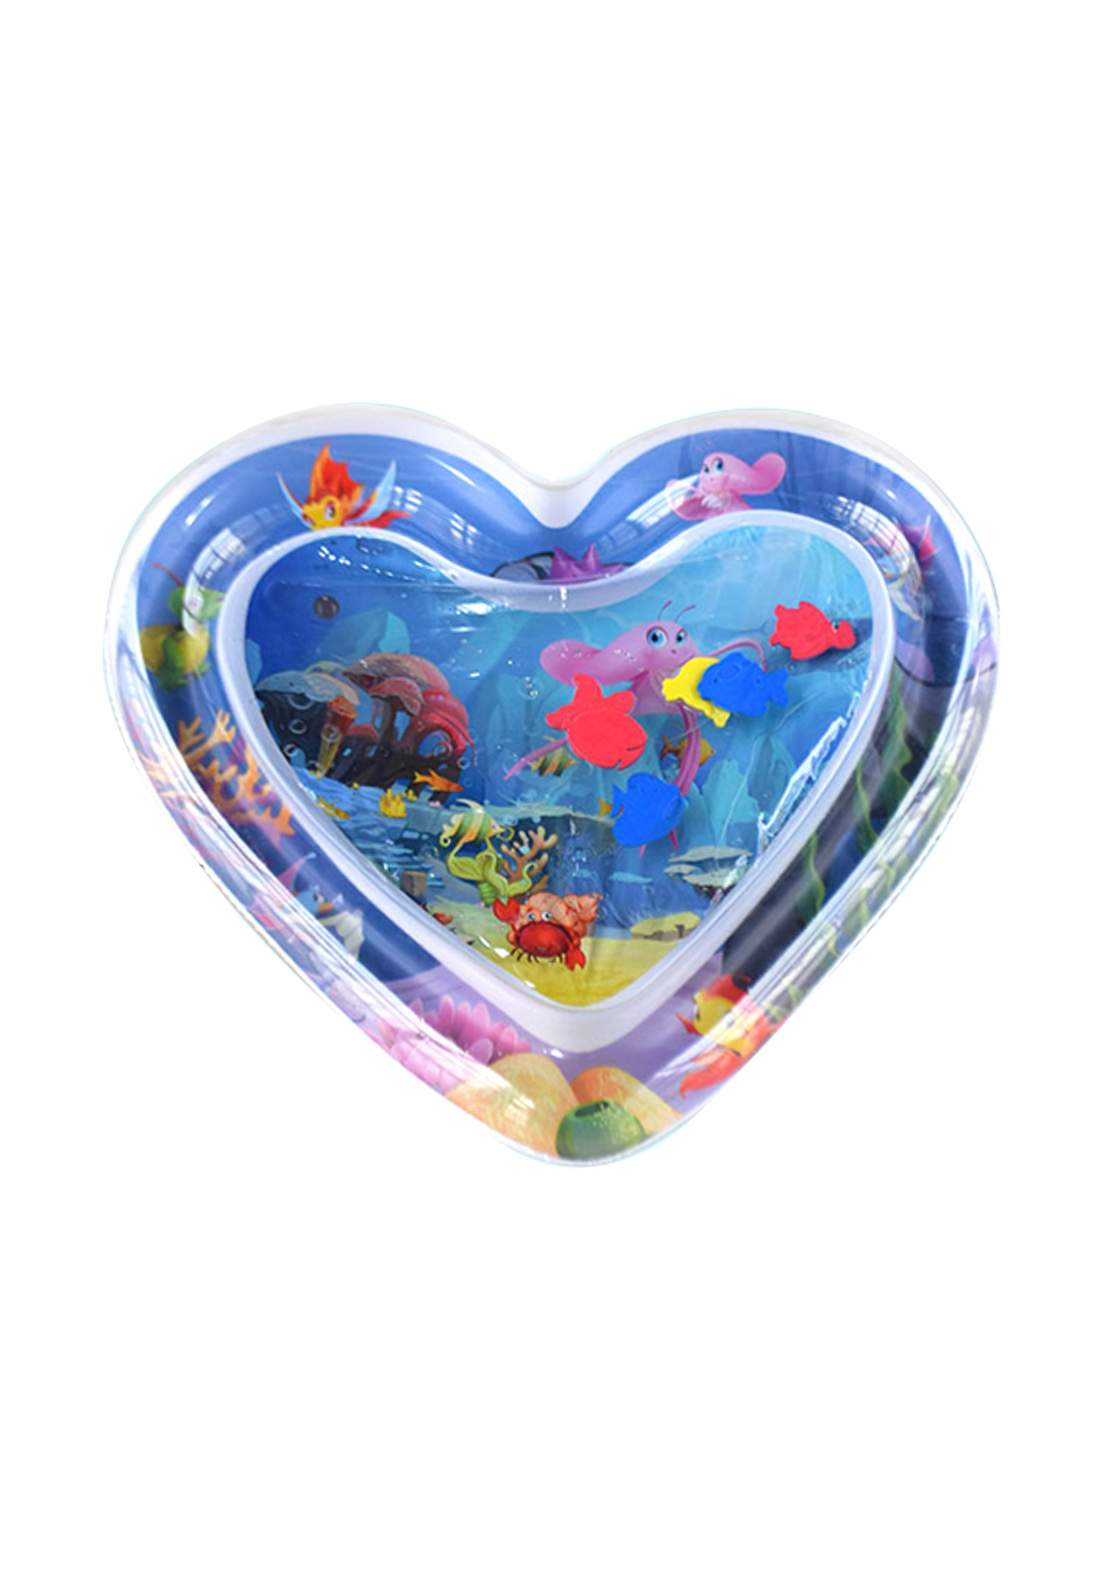 Inflatable Heart Water Mat for Kids حوض مائي للأطفال